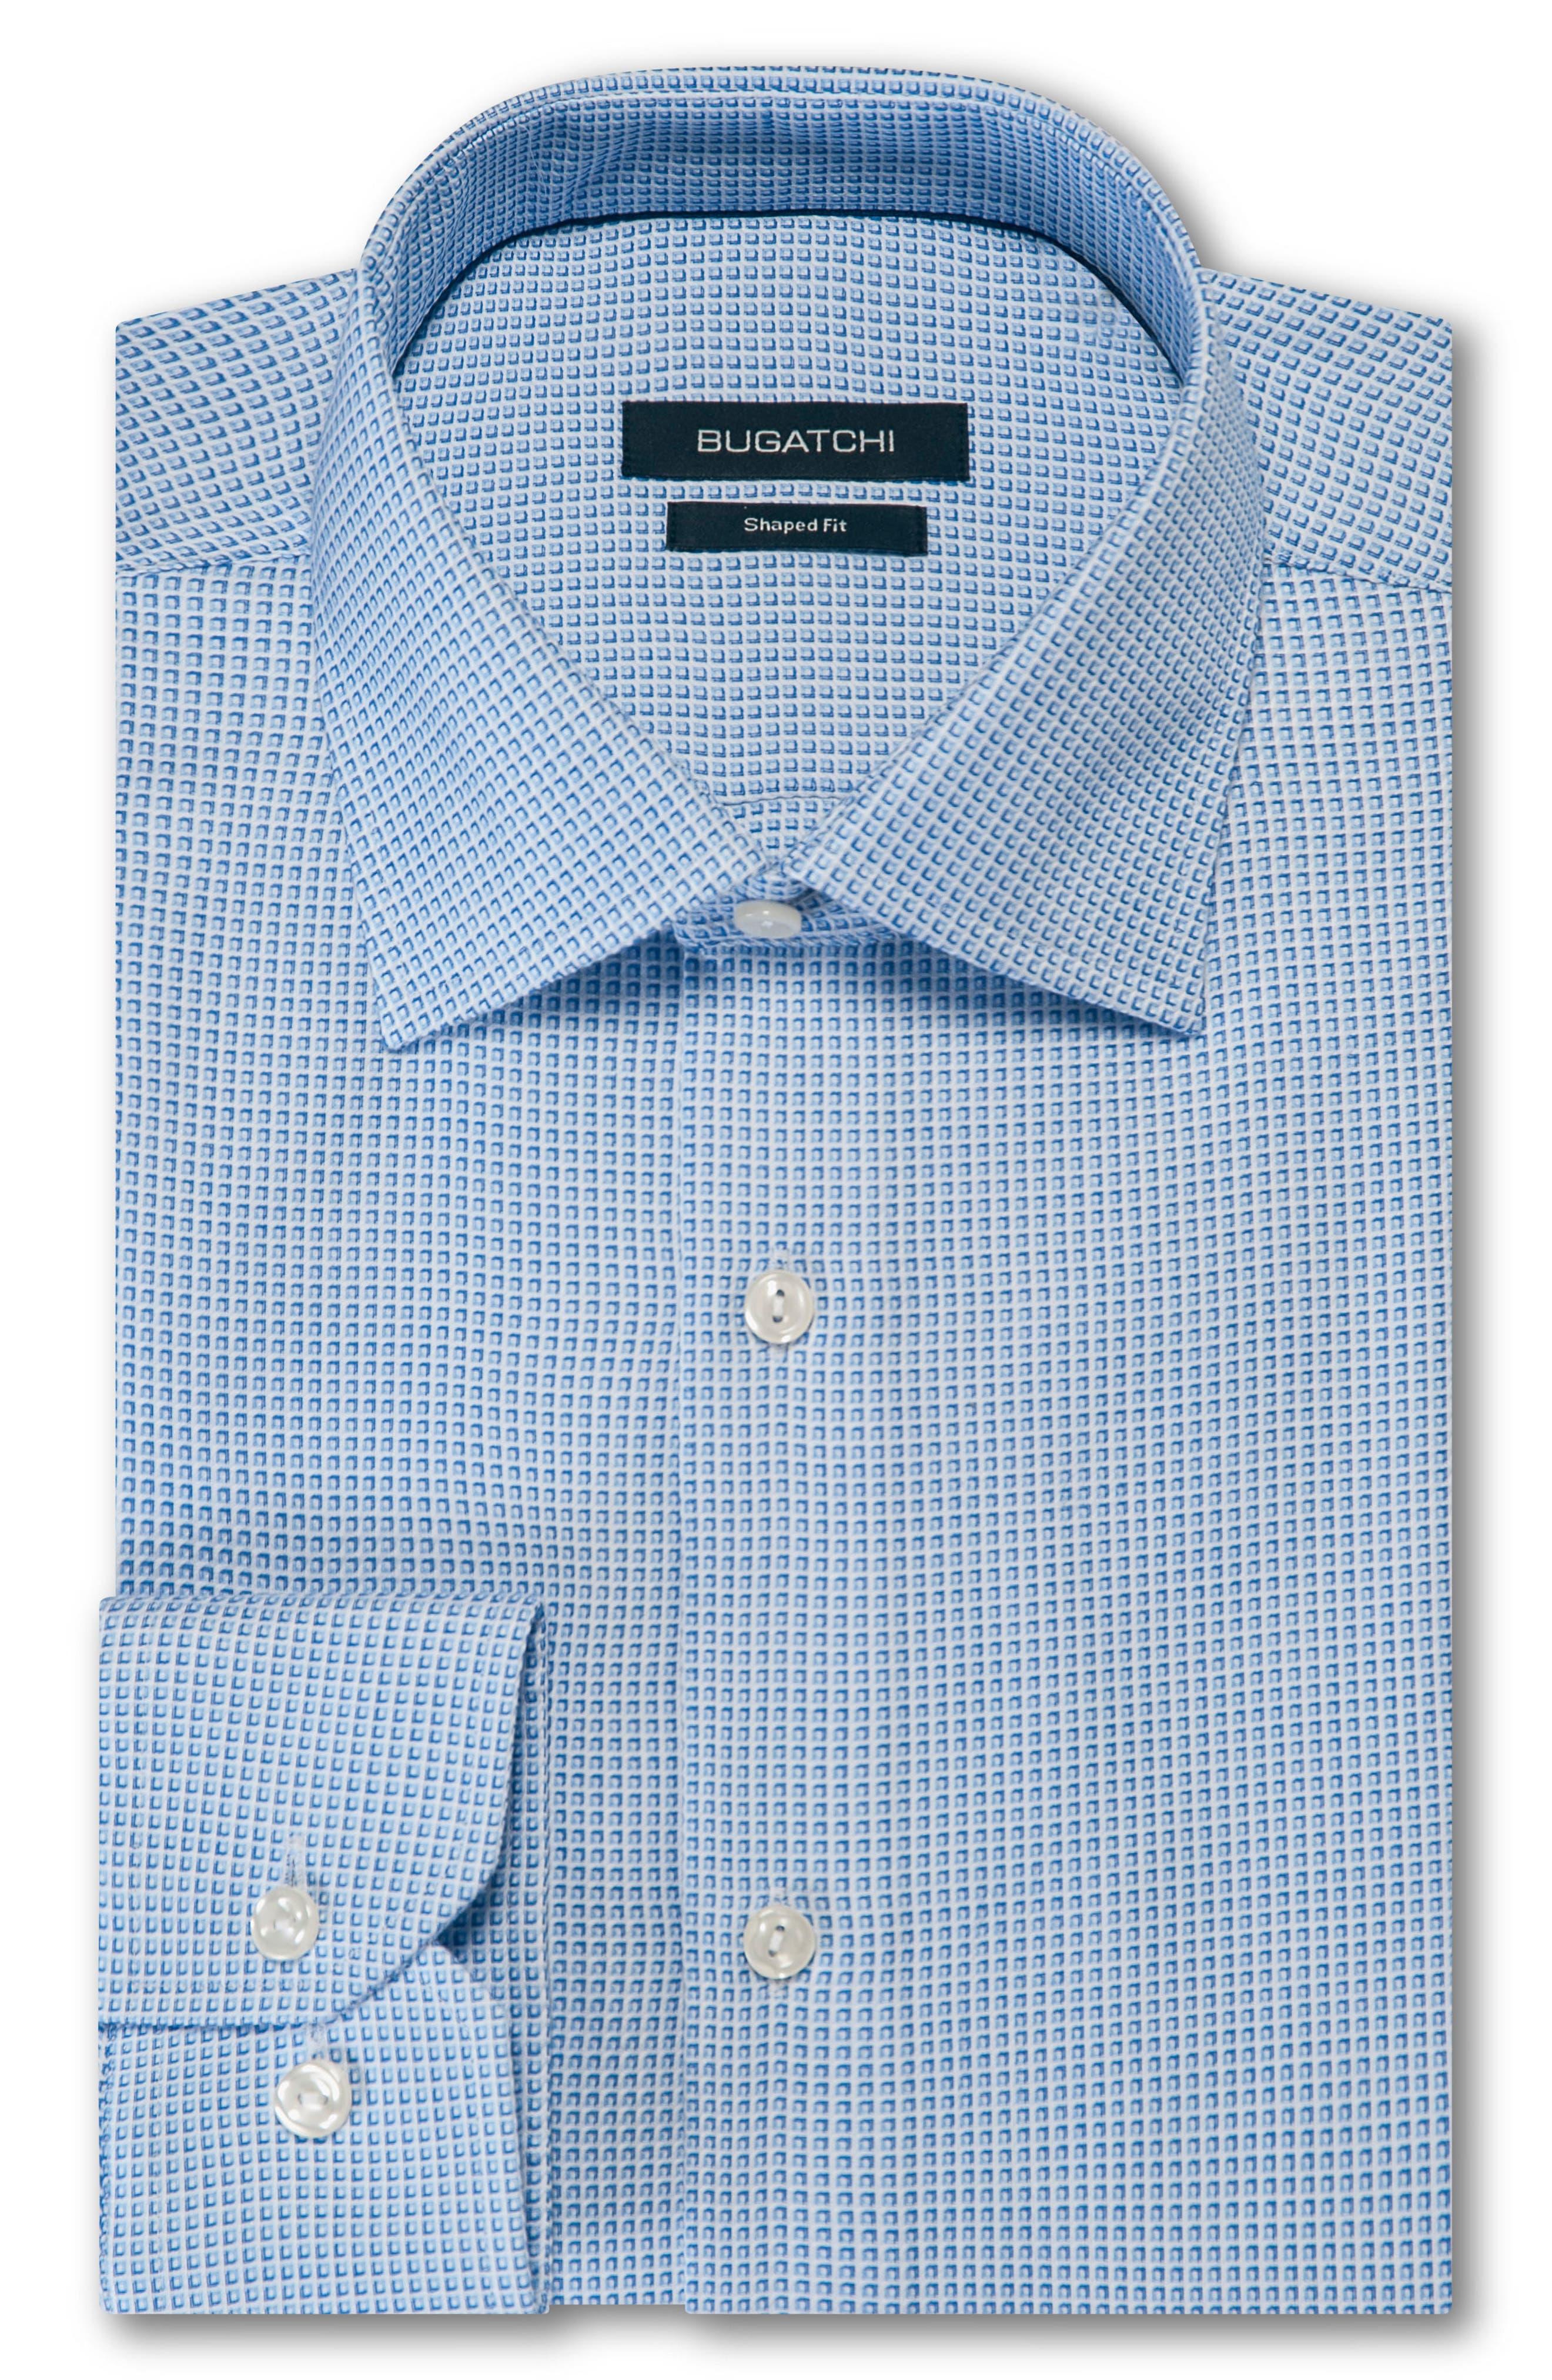 BUGATCHI, Trim Fit Check Dress Shirt, Main thumbnail 1, color, 459